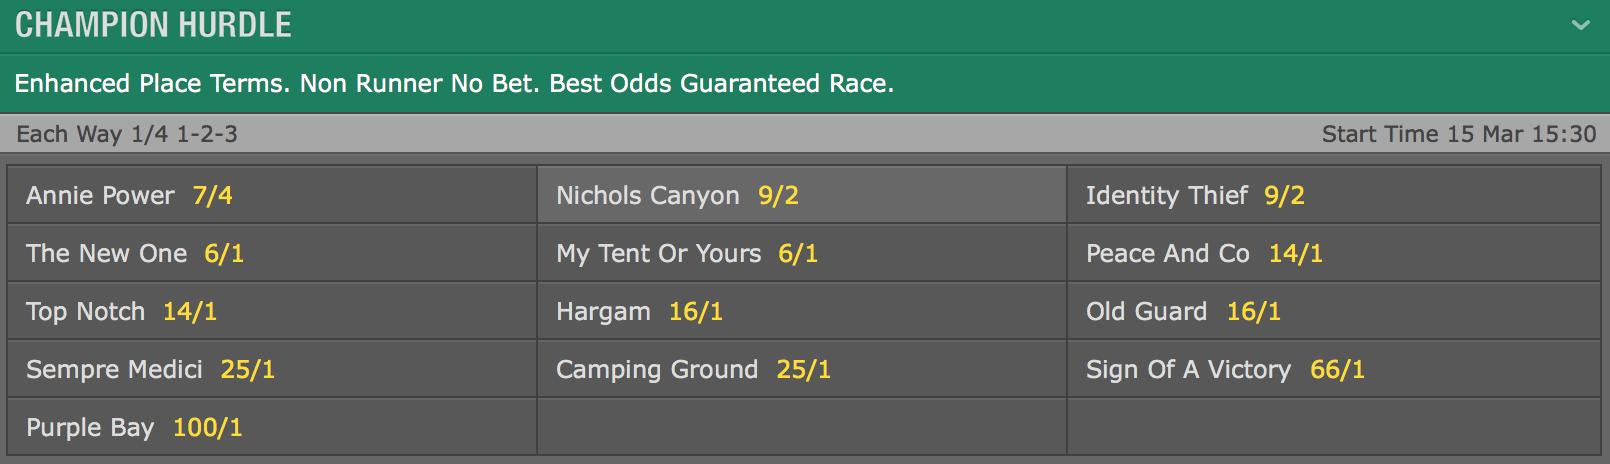 Champion Hurdle Odds